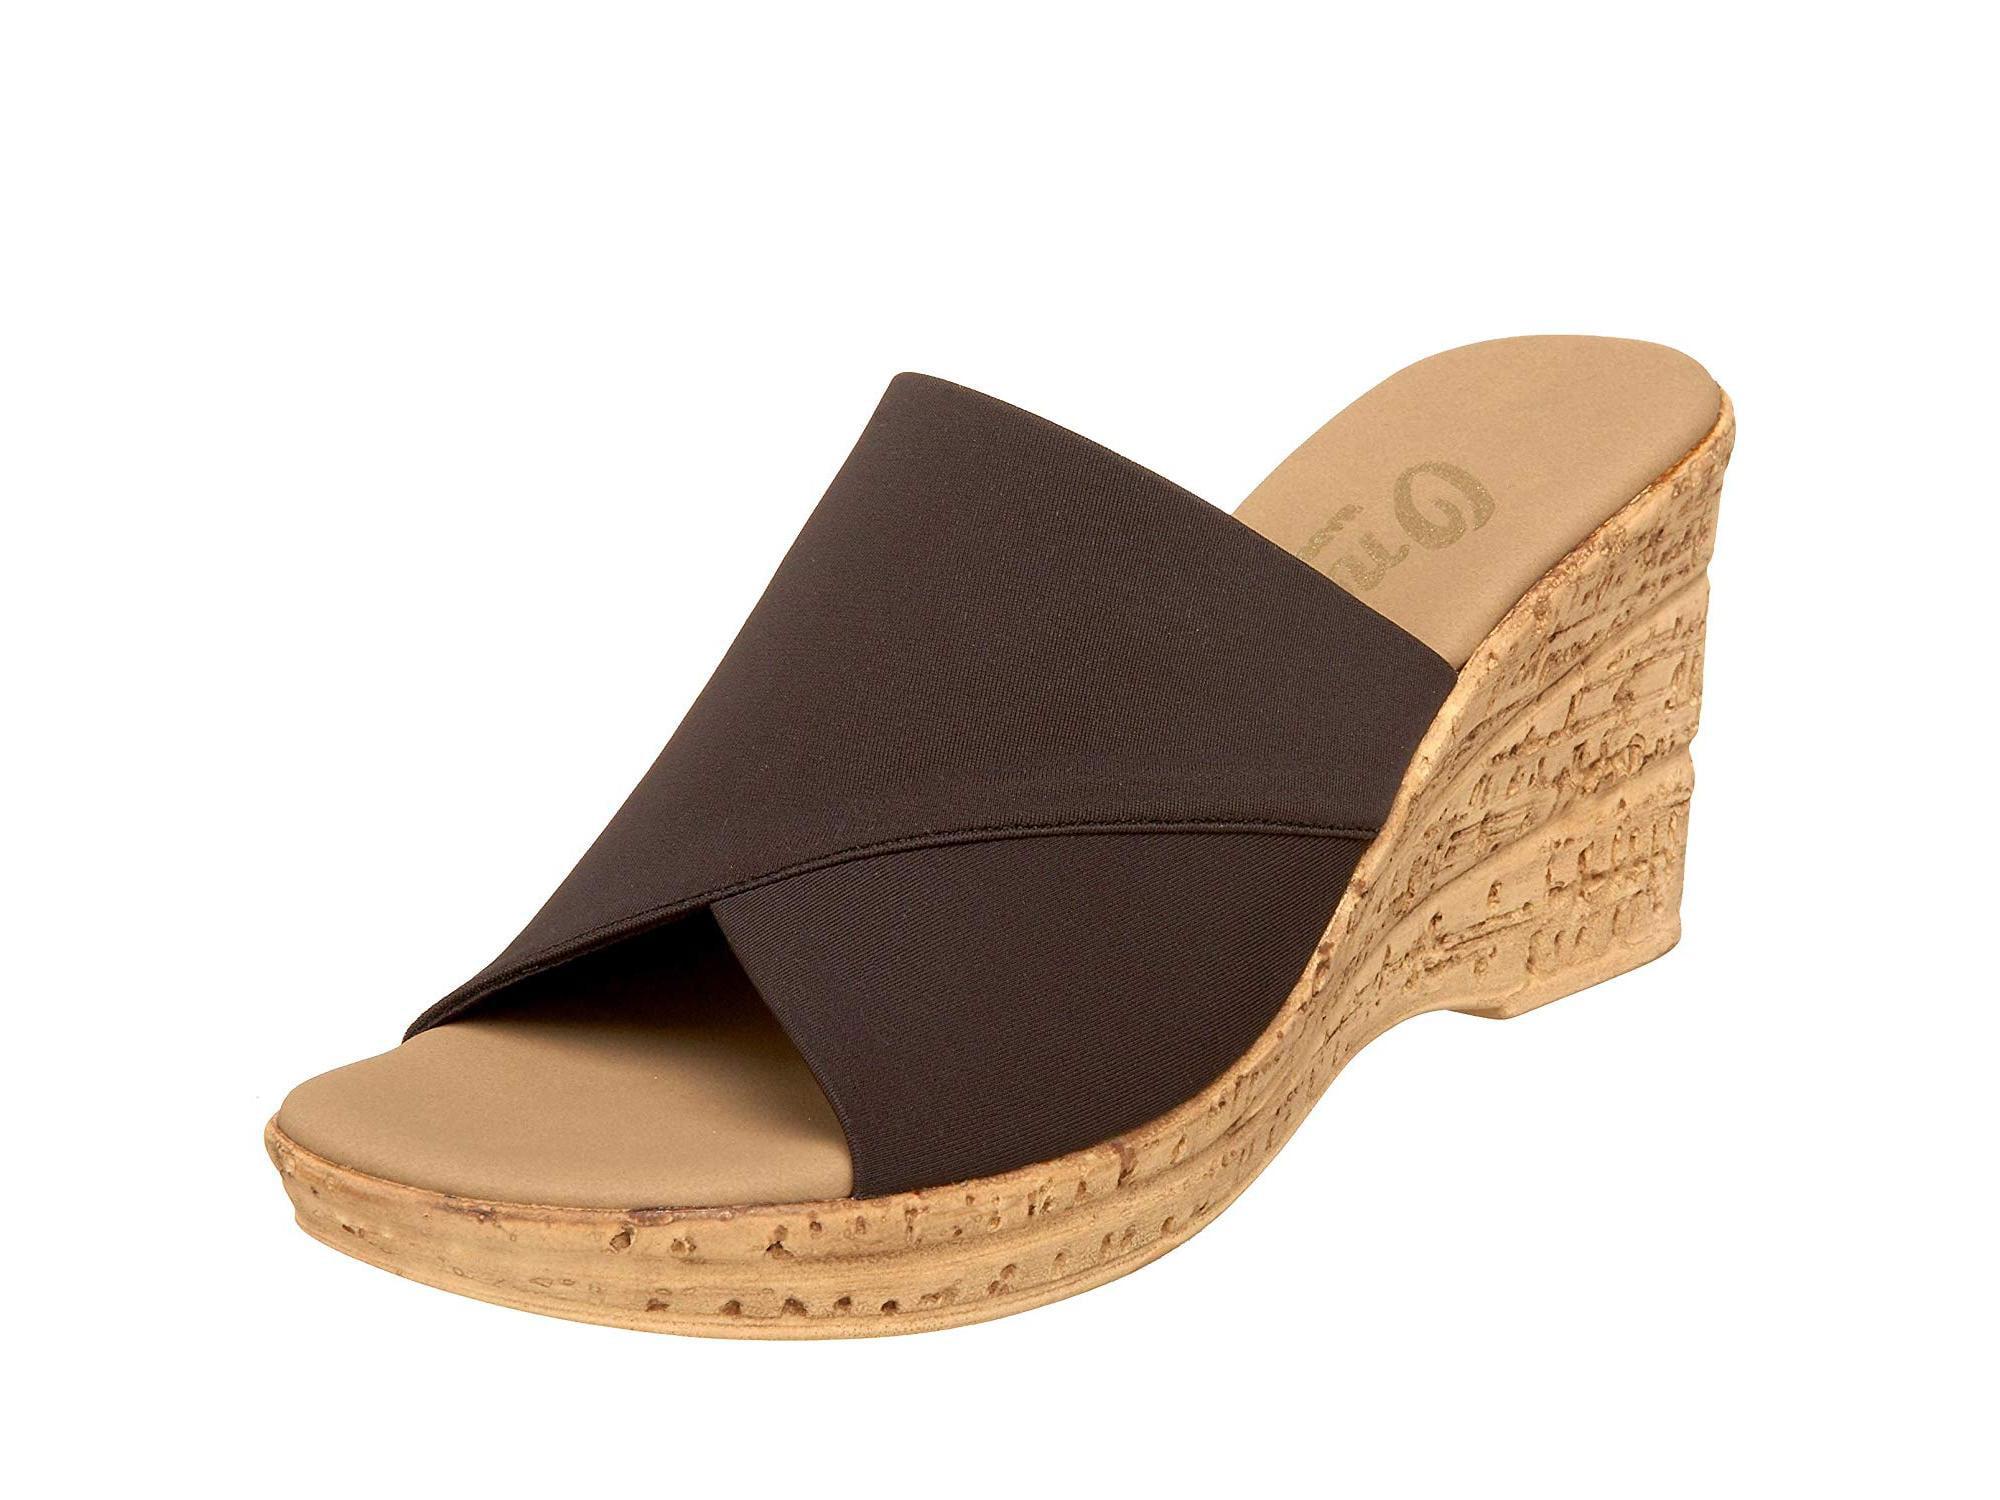 55af51acc2 Onex Womens Christina Open Toe Casual Platform Sandals ...